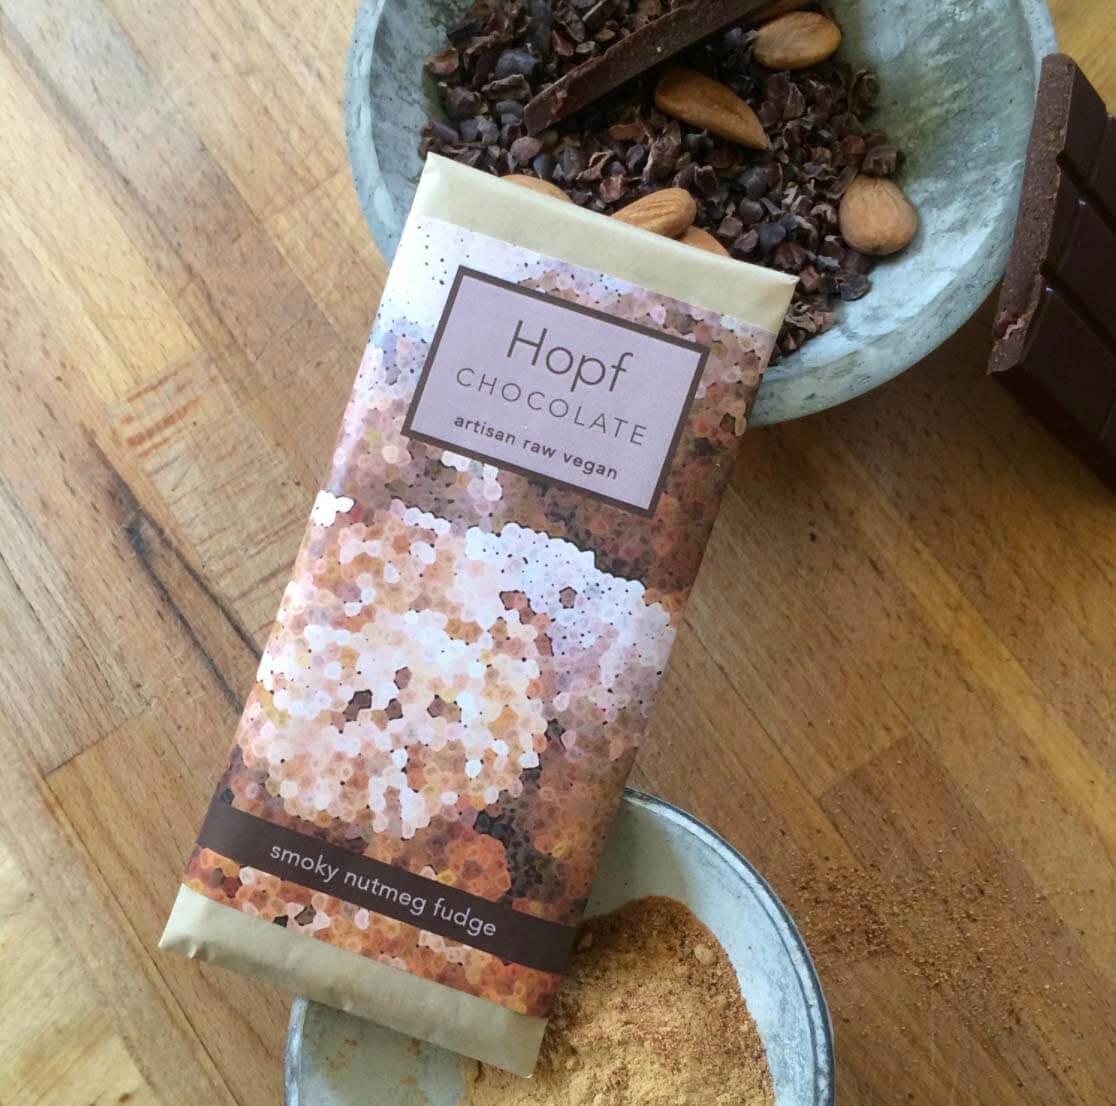 Hopf Chocolate